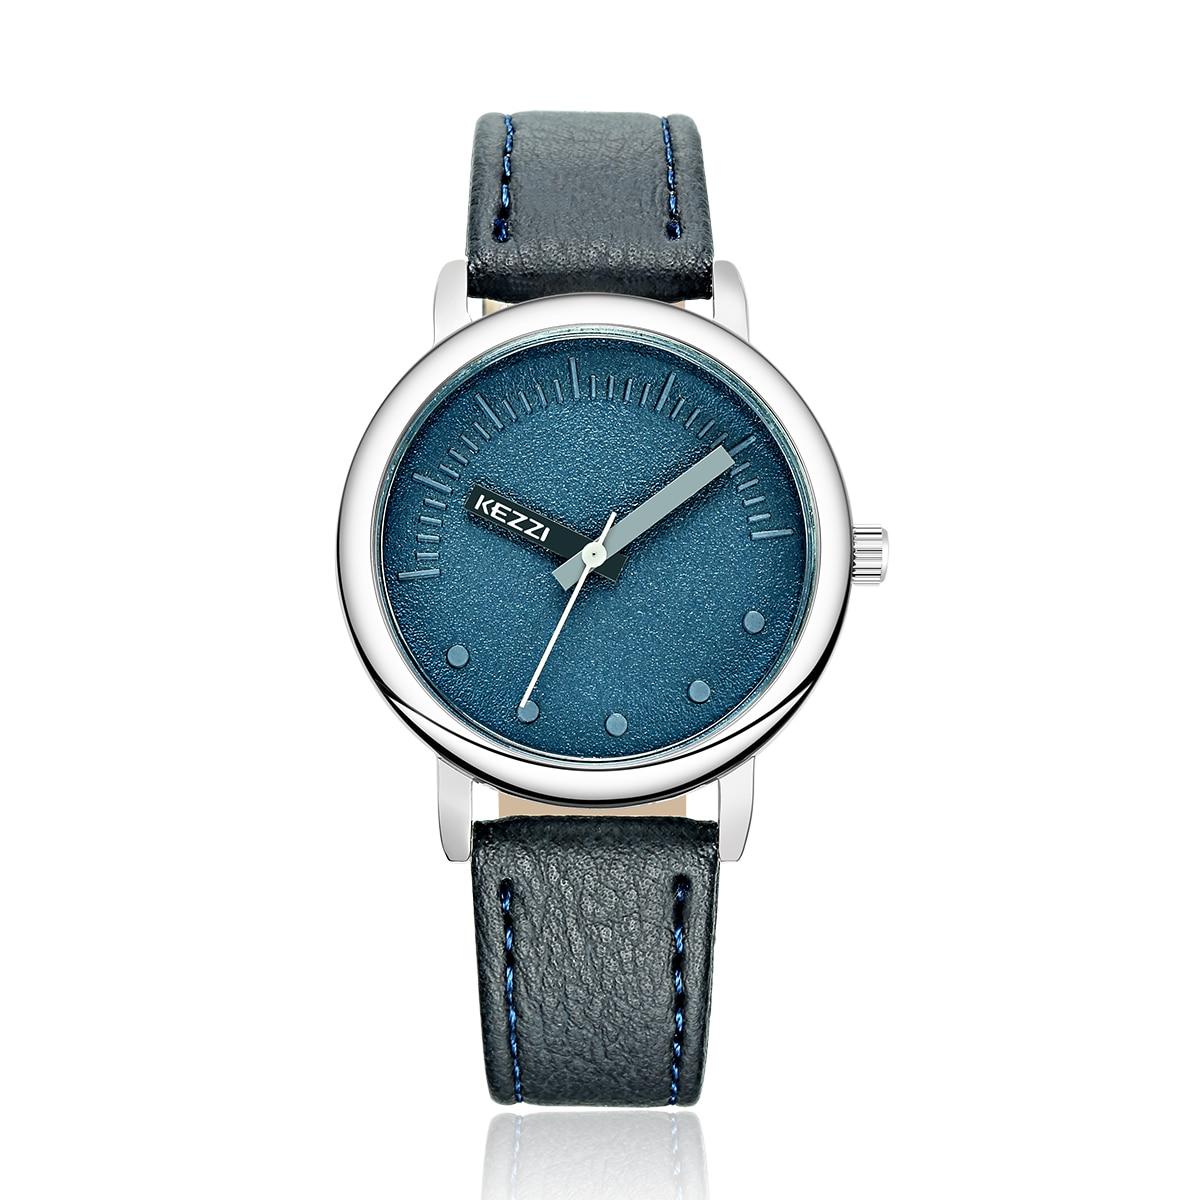 NO.2 Brand Woman Bracelet Watches Ladies Roman Numeral Stainless Steel Quartz Dress watches femal wristwatches - 3